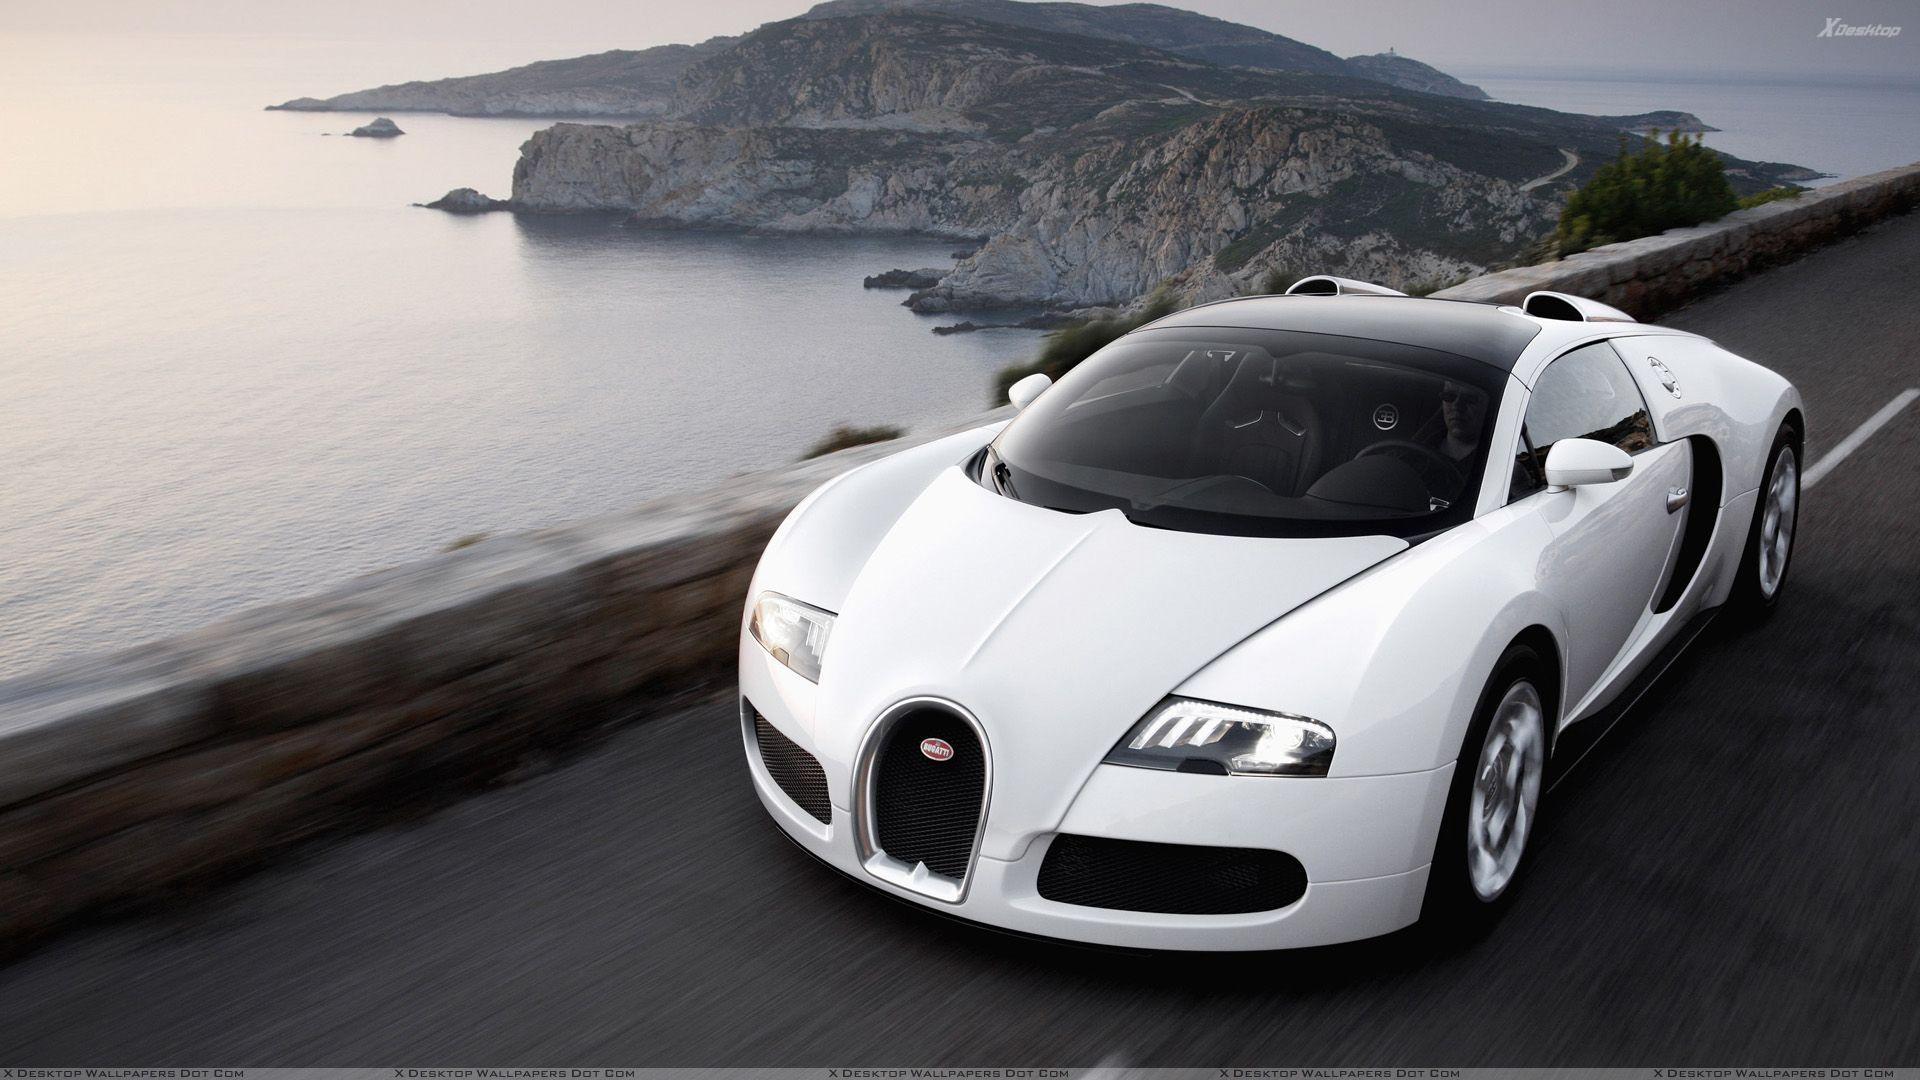 1c06dcd874b0e3b6a60437a98697823f Amazing Bugatti Veyron Price In Australia Cars Trend